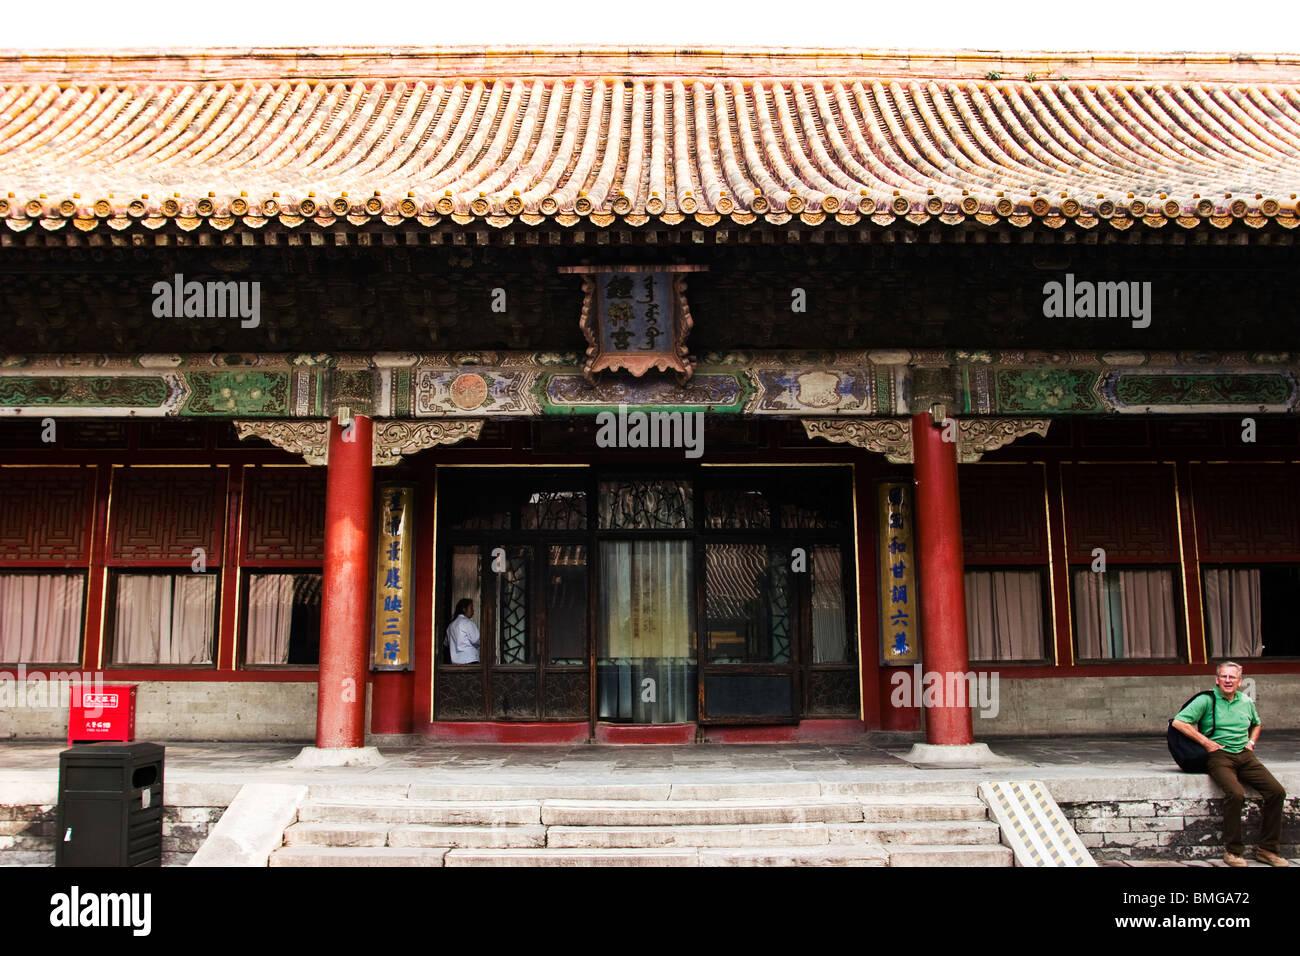 Palast der Versammlung Essenz, Verbotene Stadt, Peking, China Stockbild